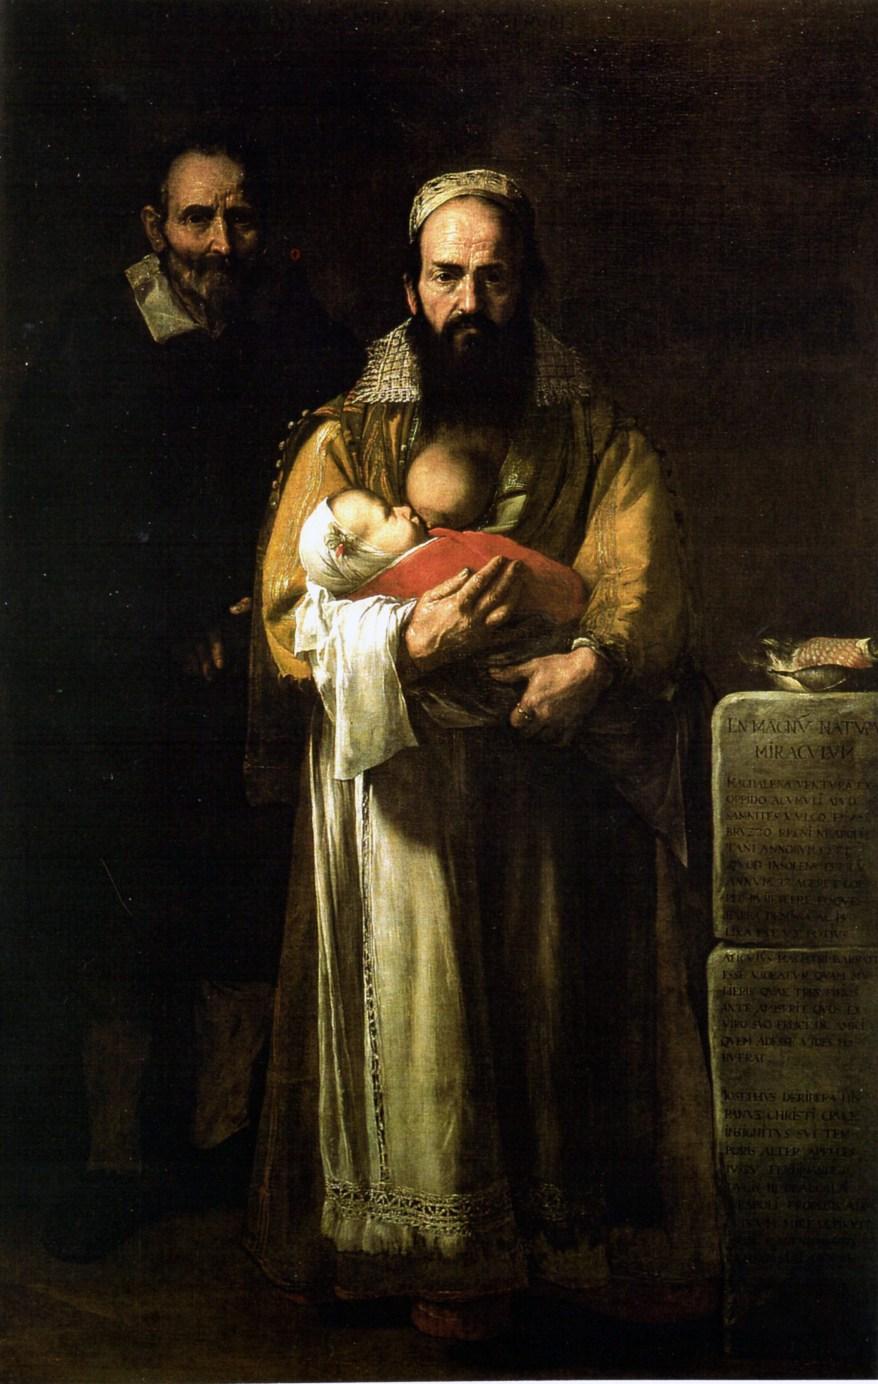 José de Ribera, Magdalena Ventura with Her Husband and Son